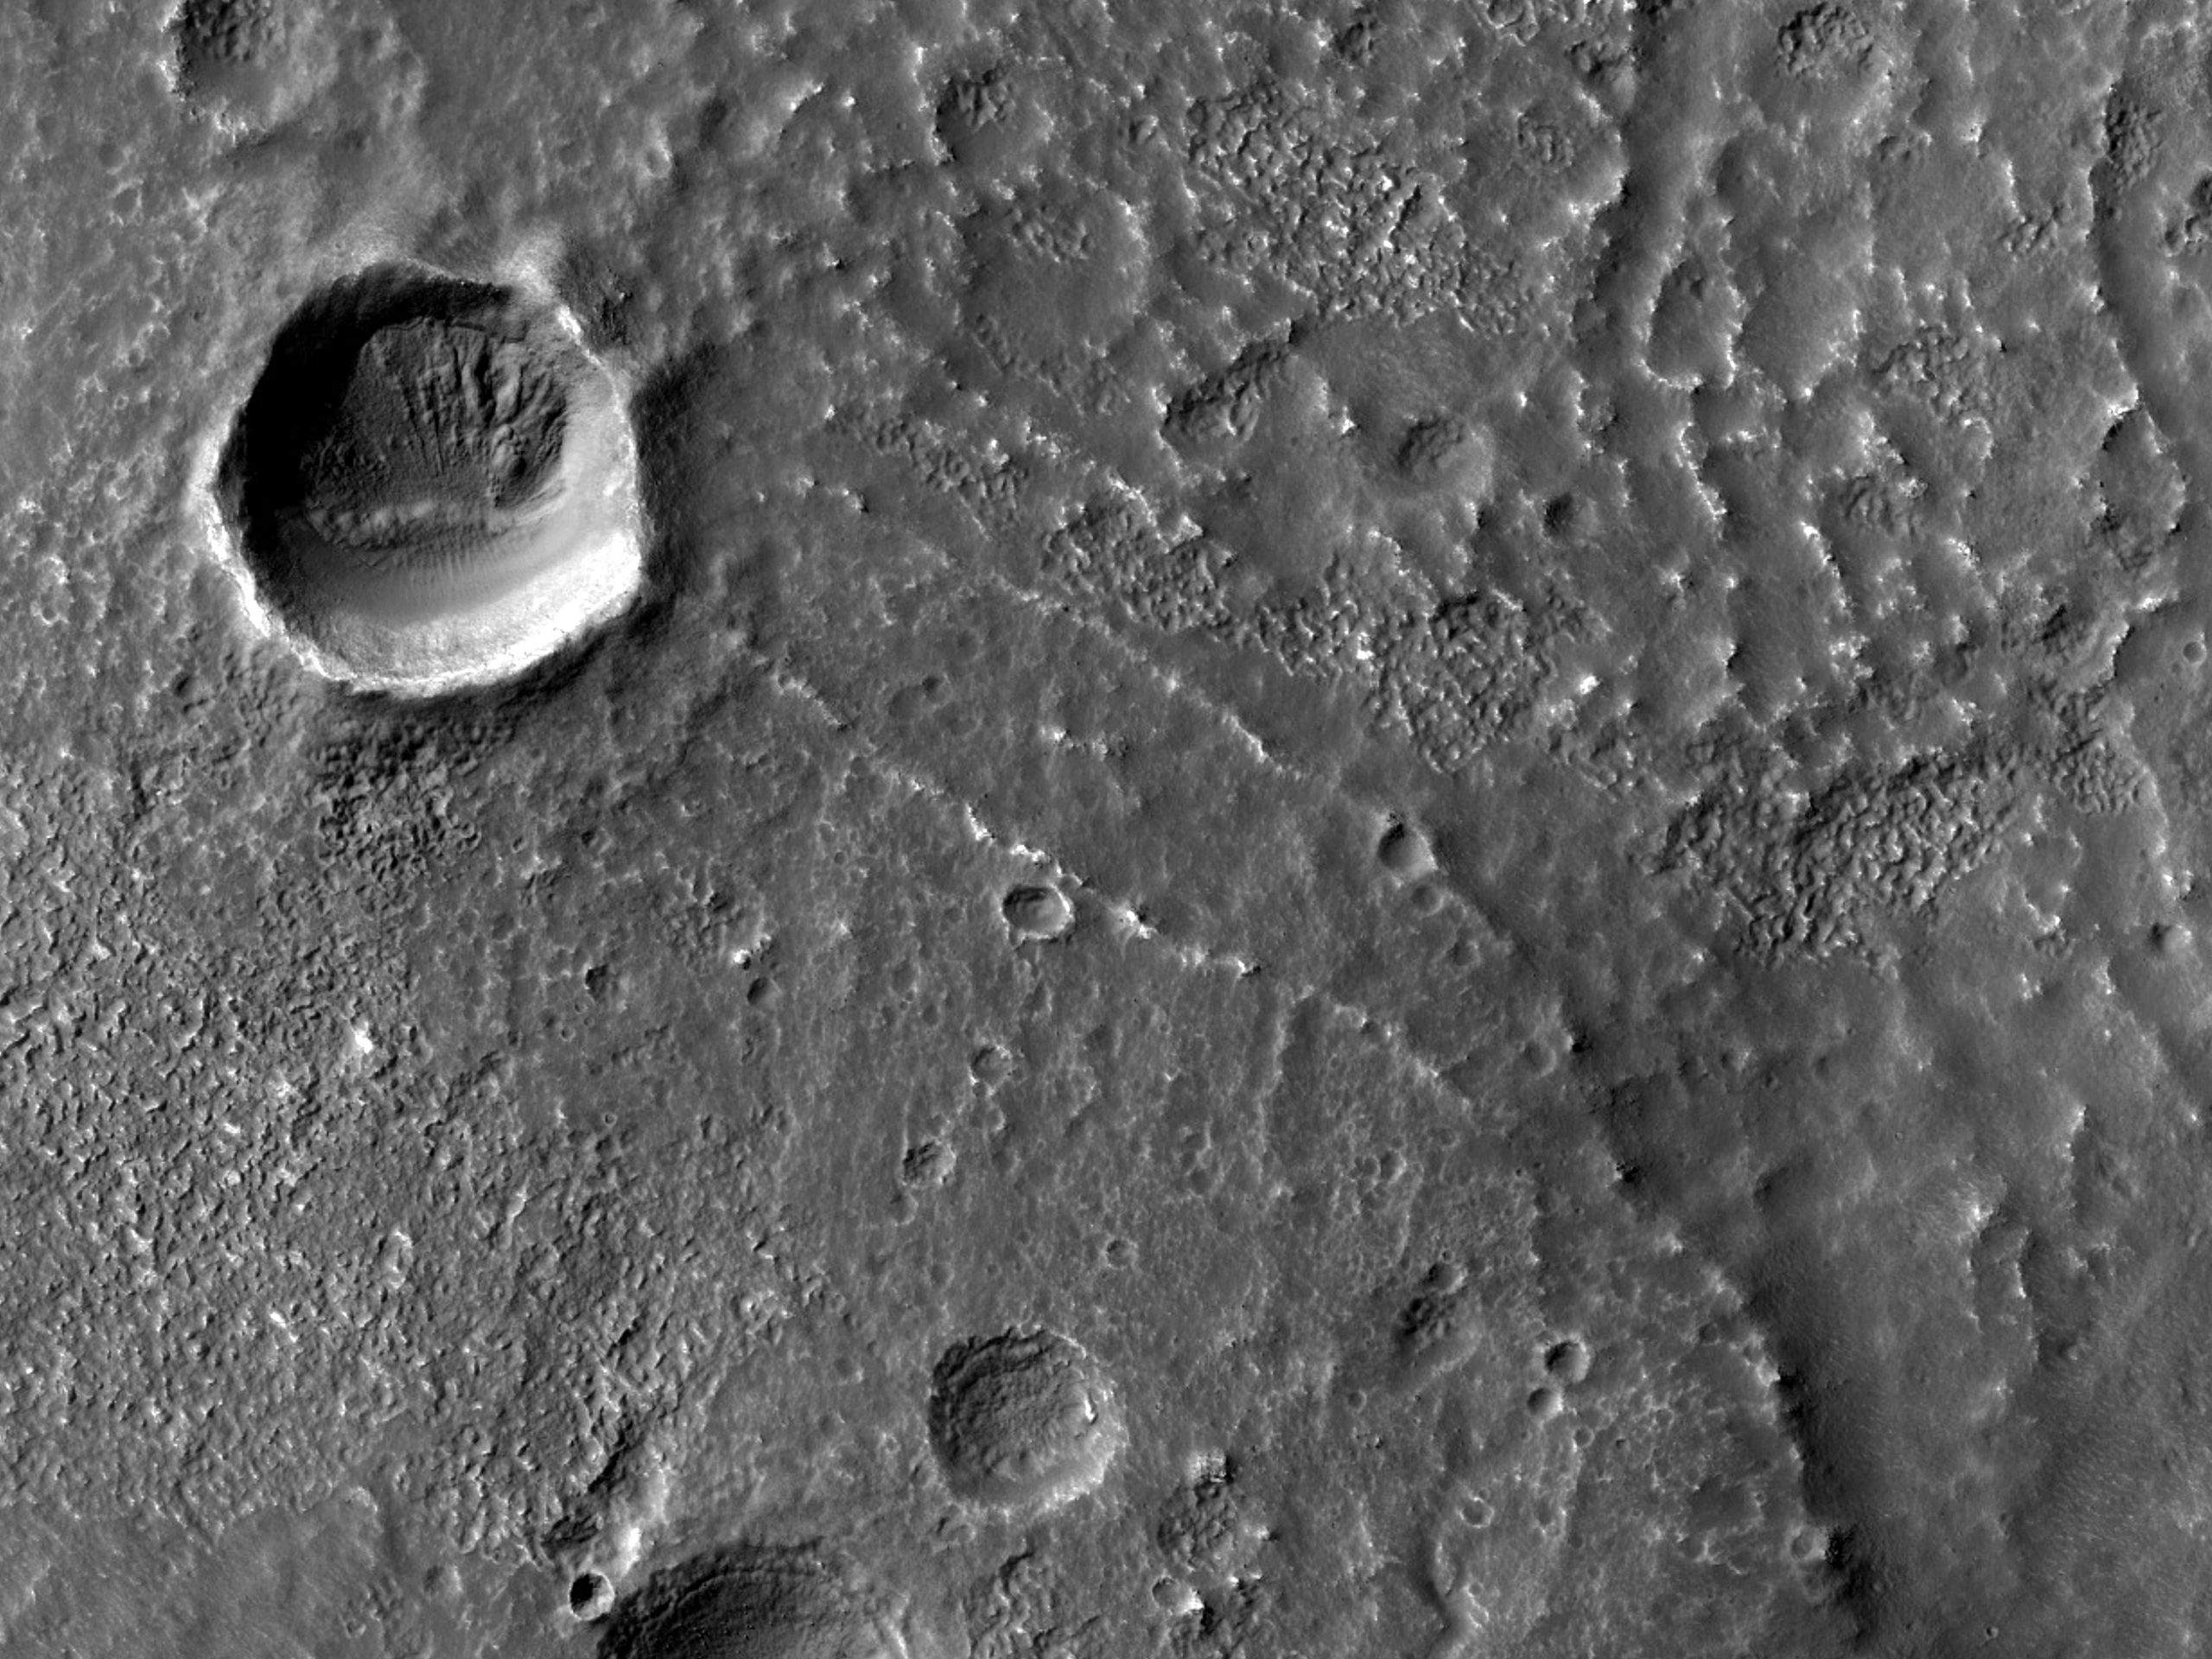 Ridges in Southern Claritas Fossae